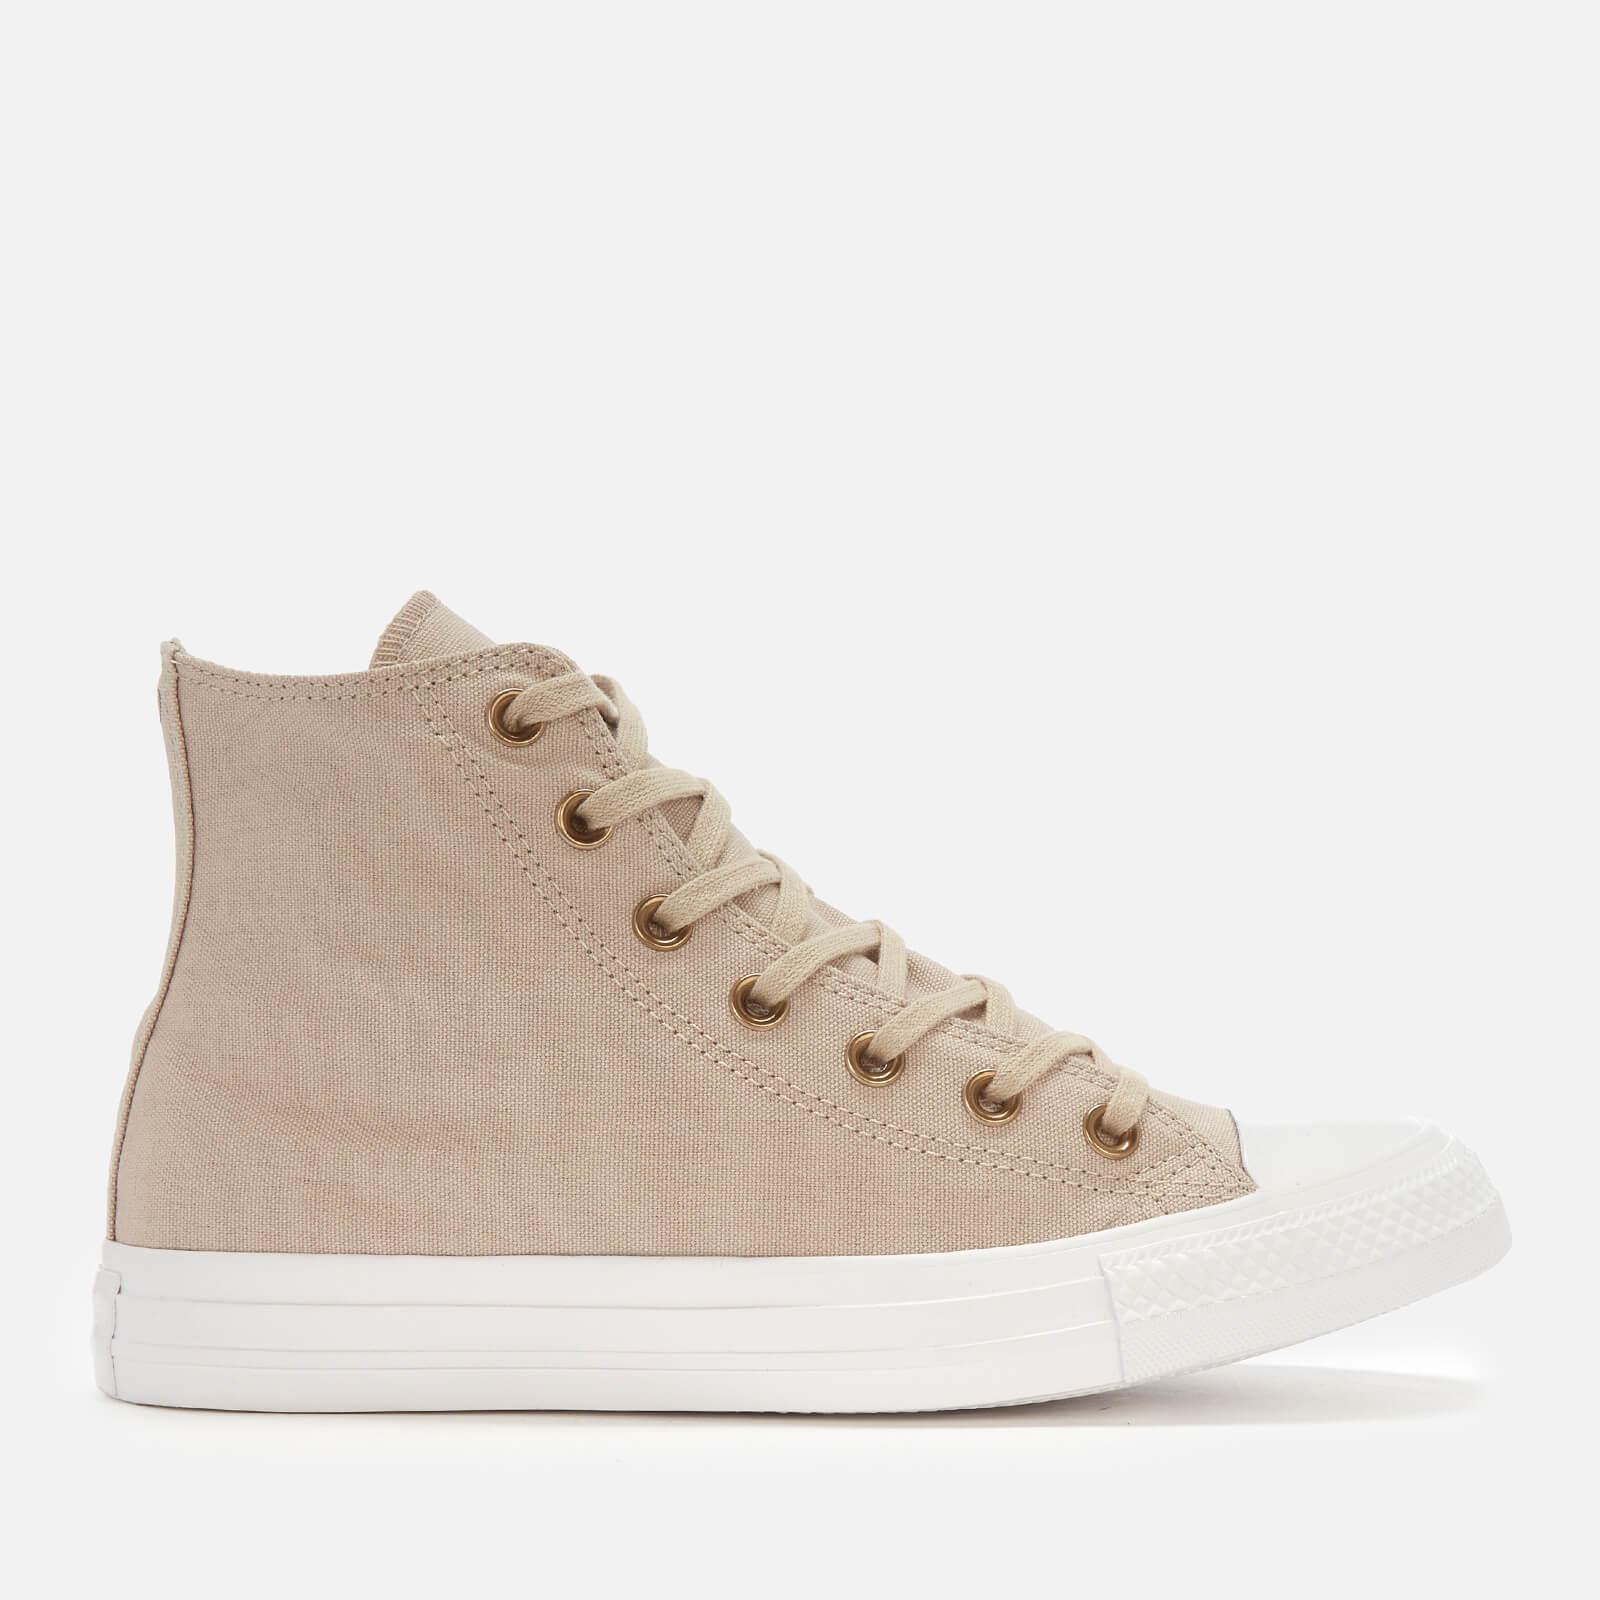 164727ce09da Converse Chuck Taylor All Star Hi-Top Trainers - Papyrus Black White Mens  Footwear